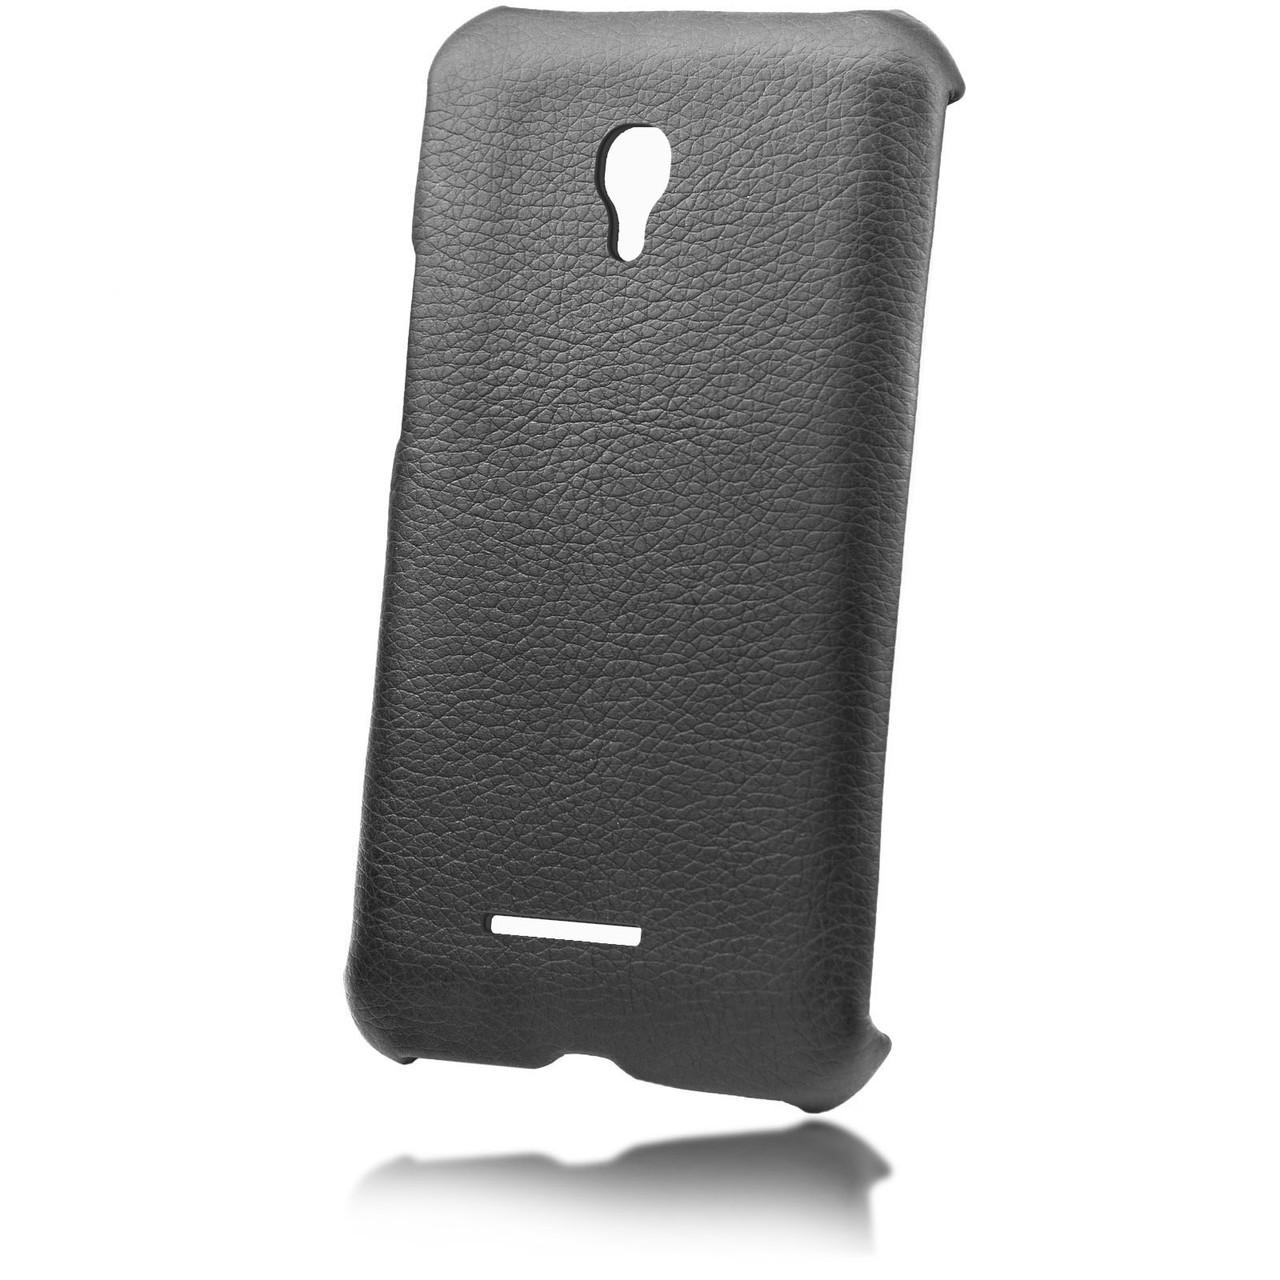 Чехол-бампер Alcatel 4024D Pixi First